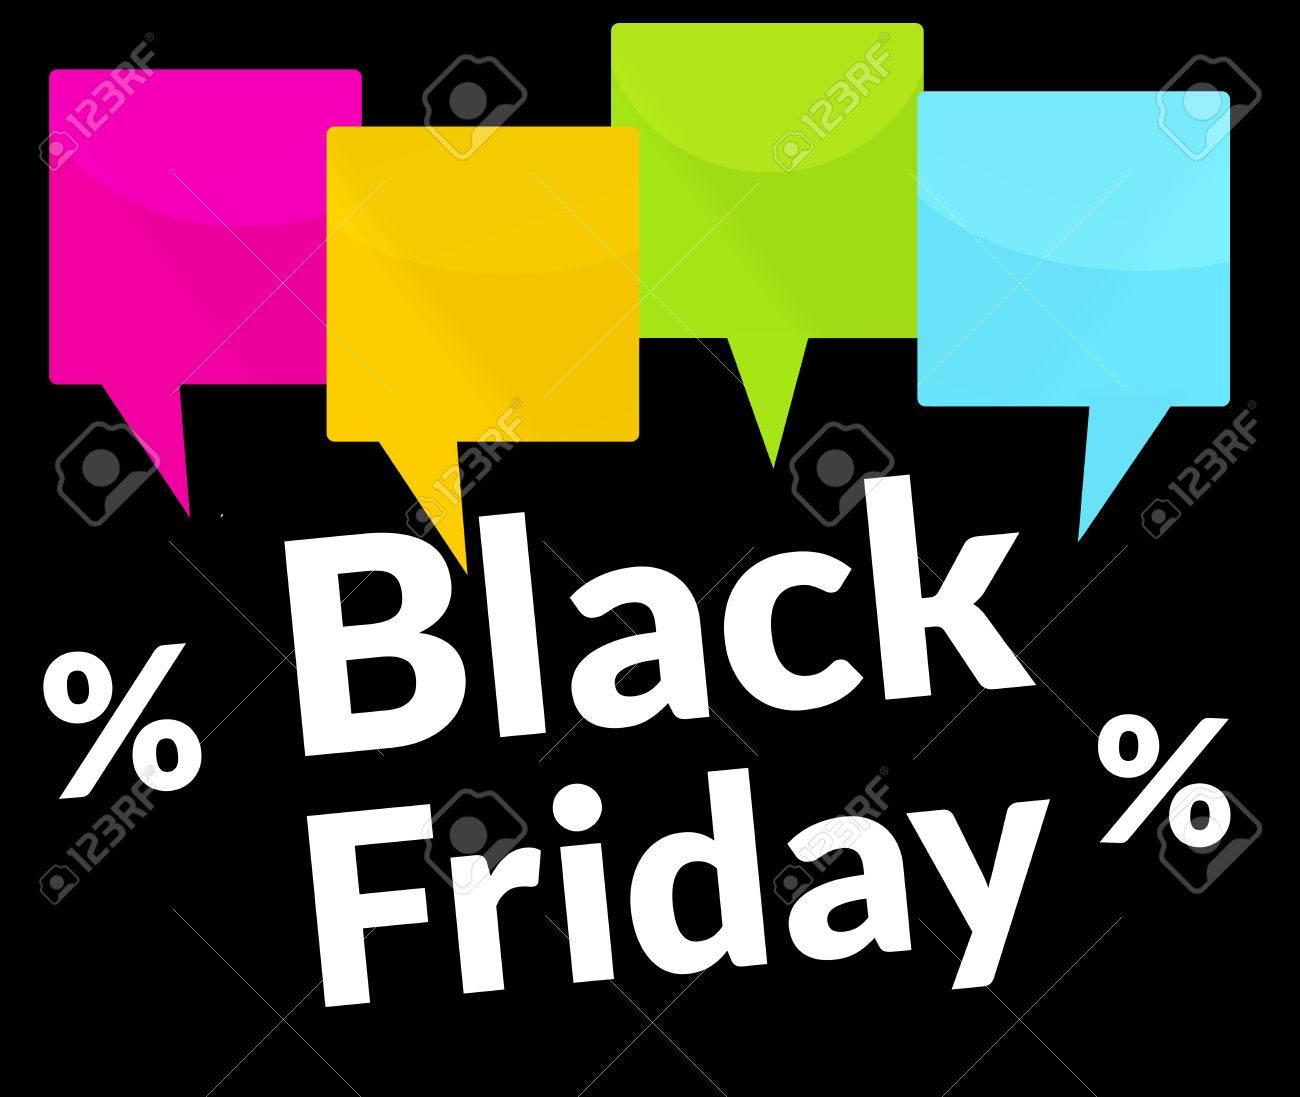 Black Friday - 38768366